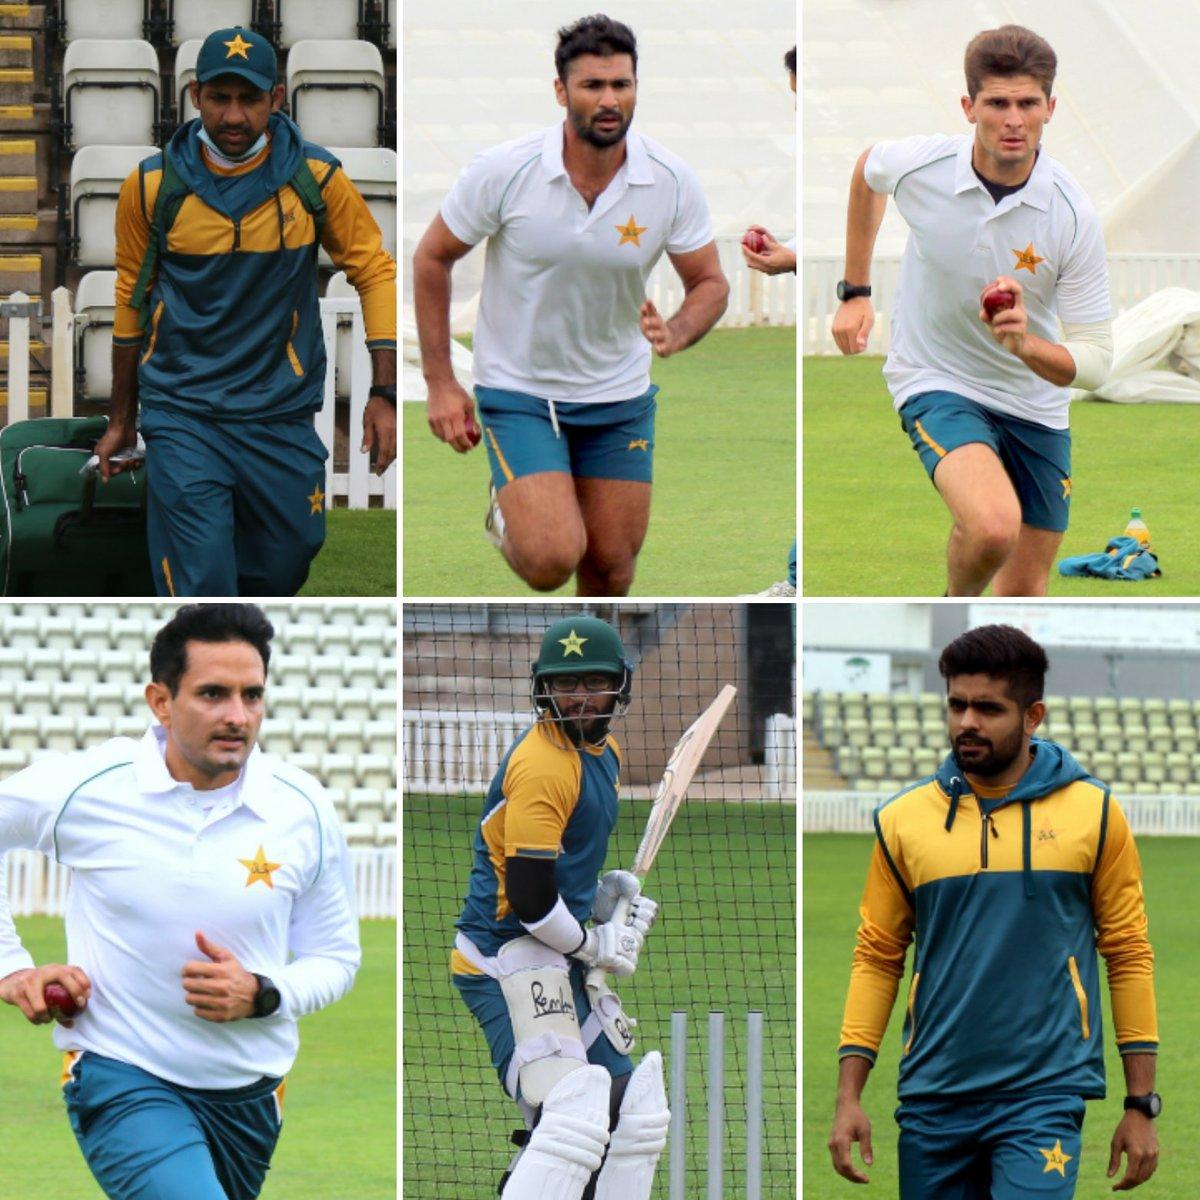 Day 2: Pakistan team practice session is underway at Worcester, England.  PC: PCB   #ENGvPAK #Cricket #Pakistan #SarfarazAhmed #SohailKhan #ShaheenShahAfridi #MohammadAbbas #ImamUlHaq #BabarAzam https://t.co/KoPhDbchjk